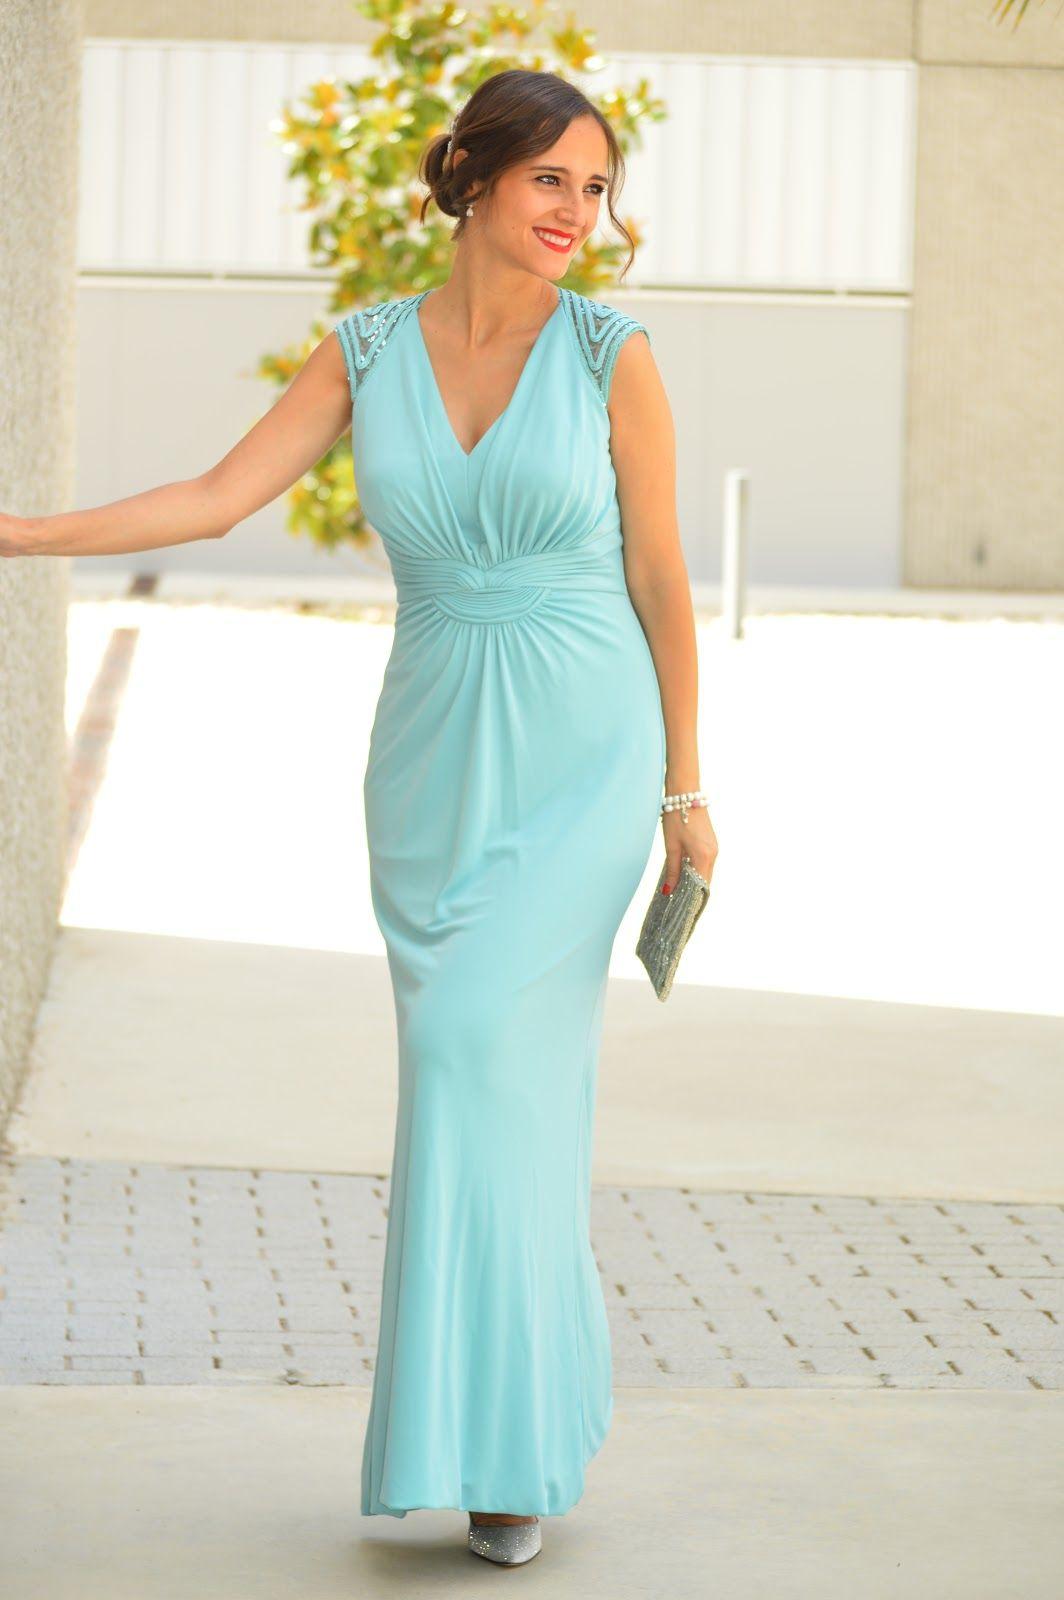 maneras de vestir invitada turqouise blue embellished maxi